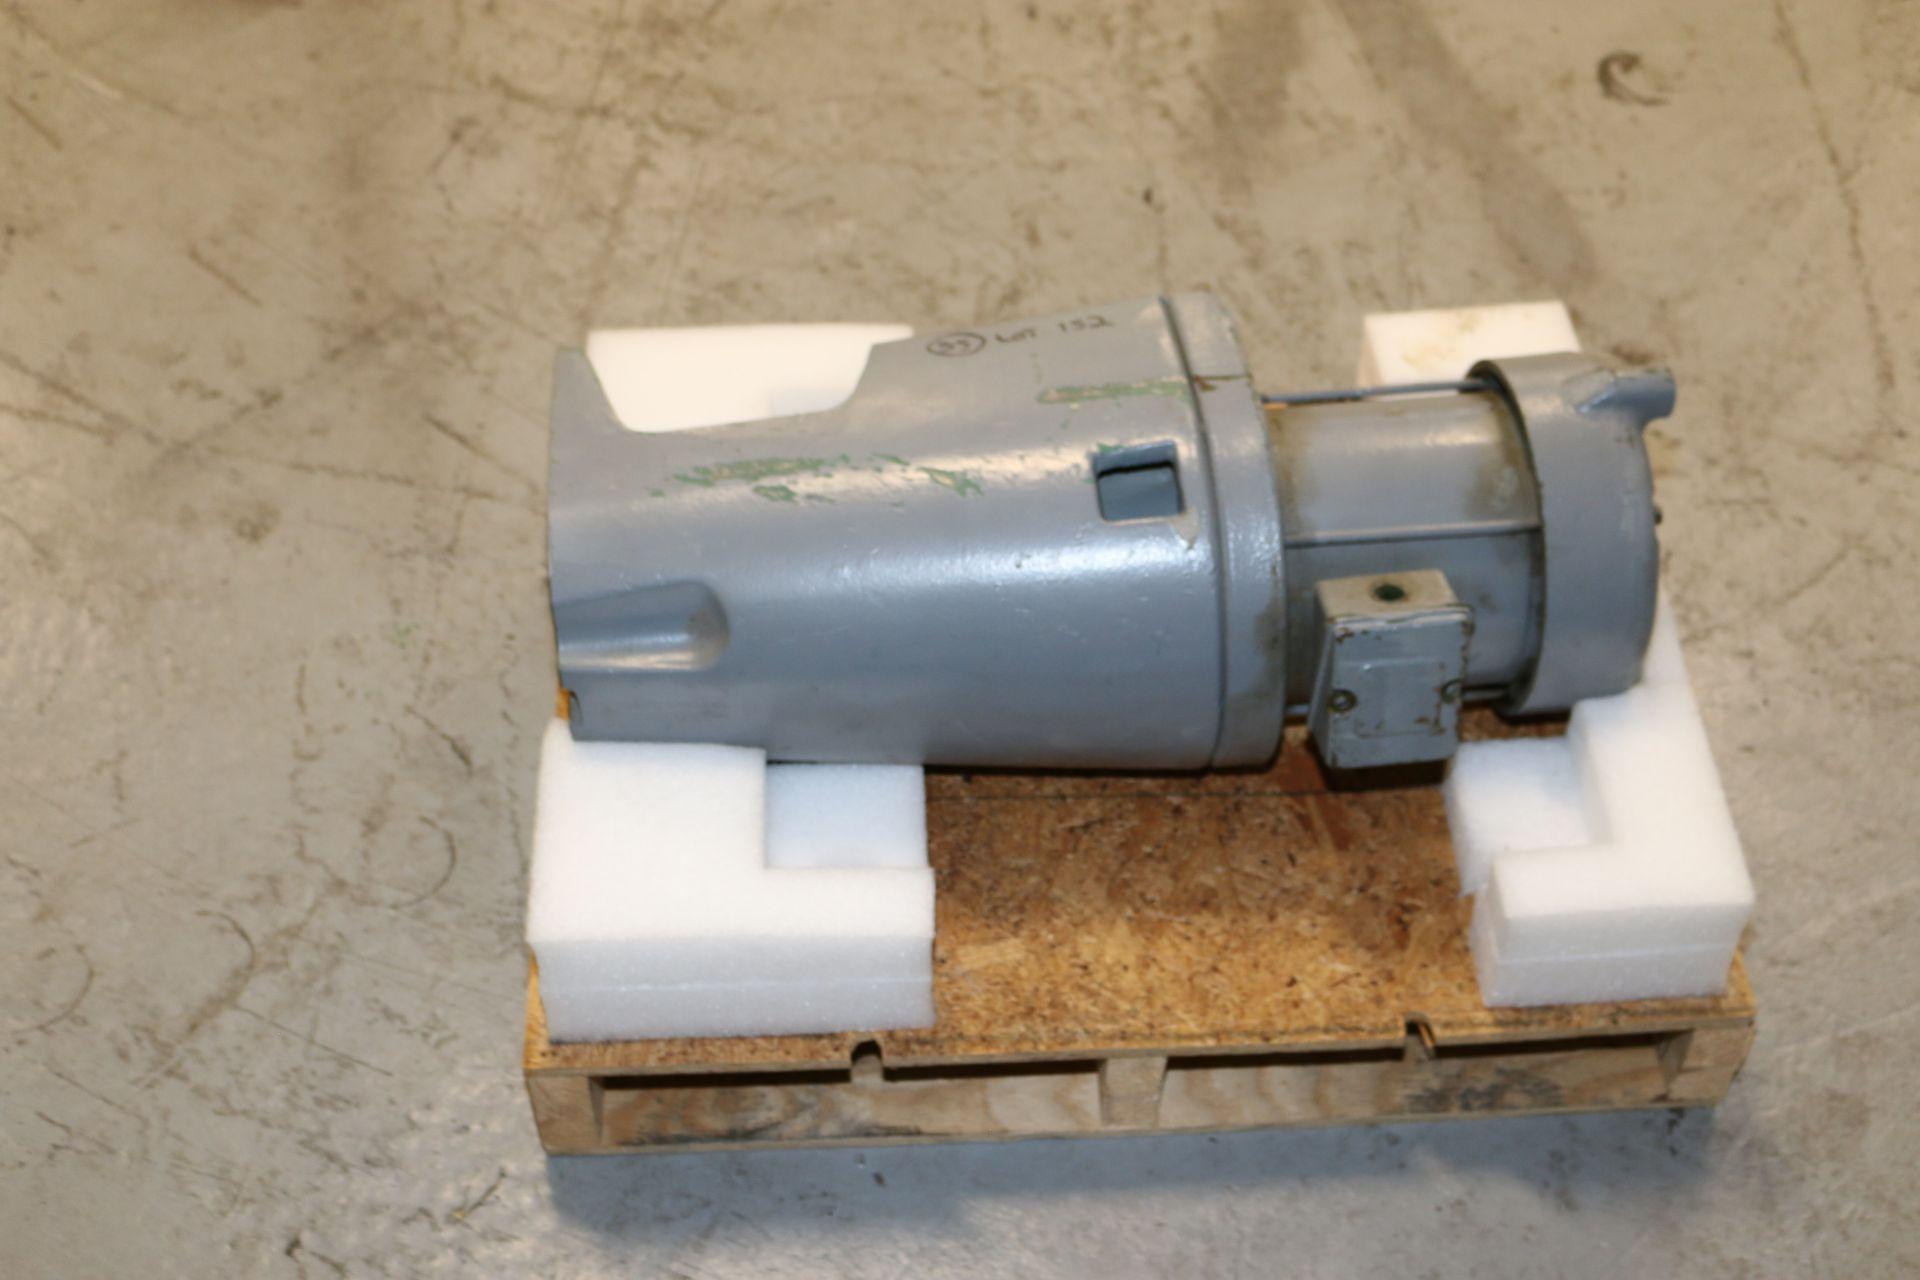 Lot 126 - Lightnin Agitator Drive Motor, 1 hp / 1150 RPM, 230 - 460V 3 Phase (IN#69089)(LOCATED AT M. DAVIS